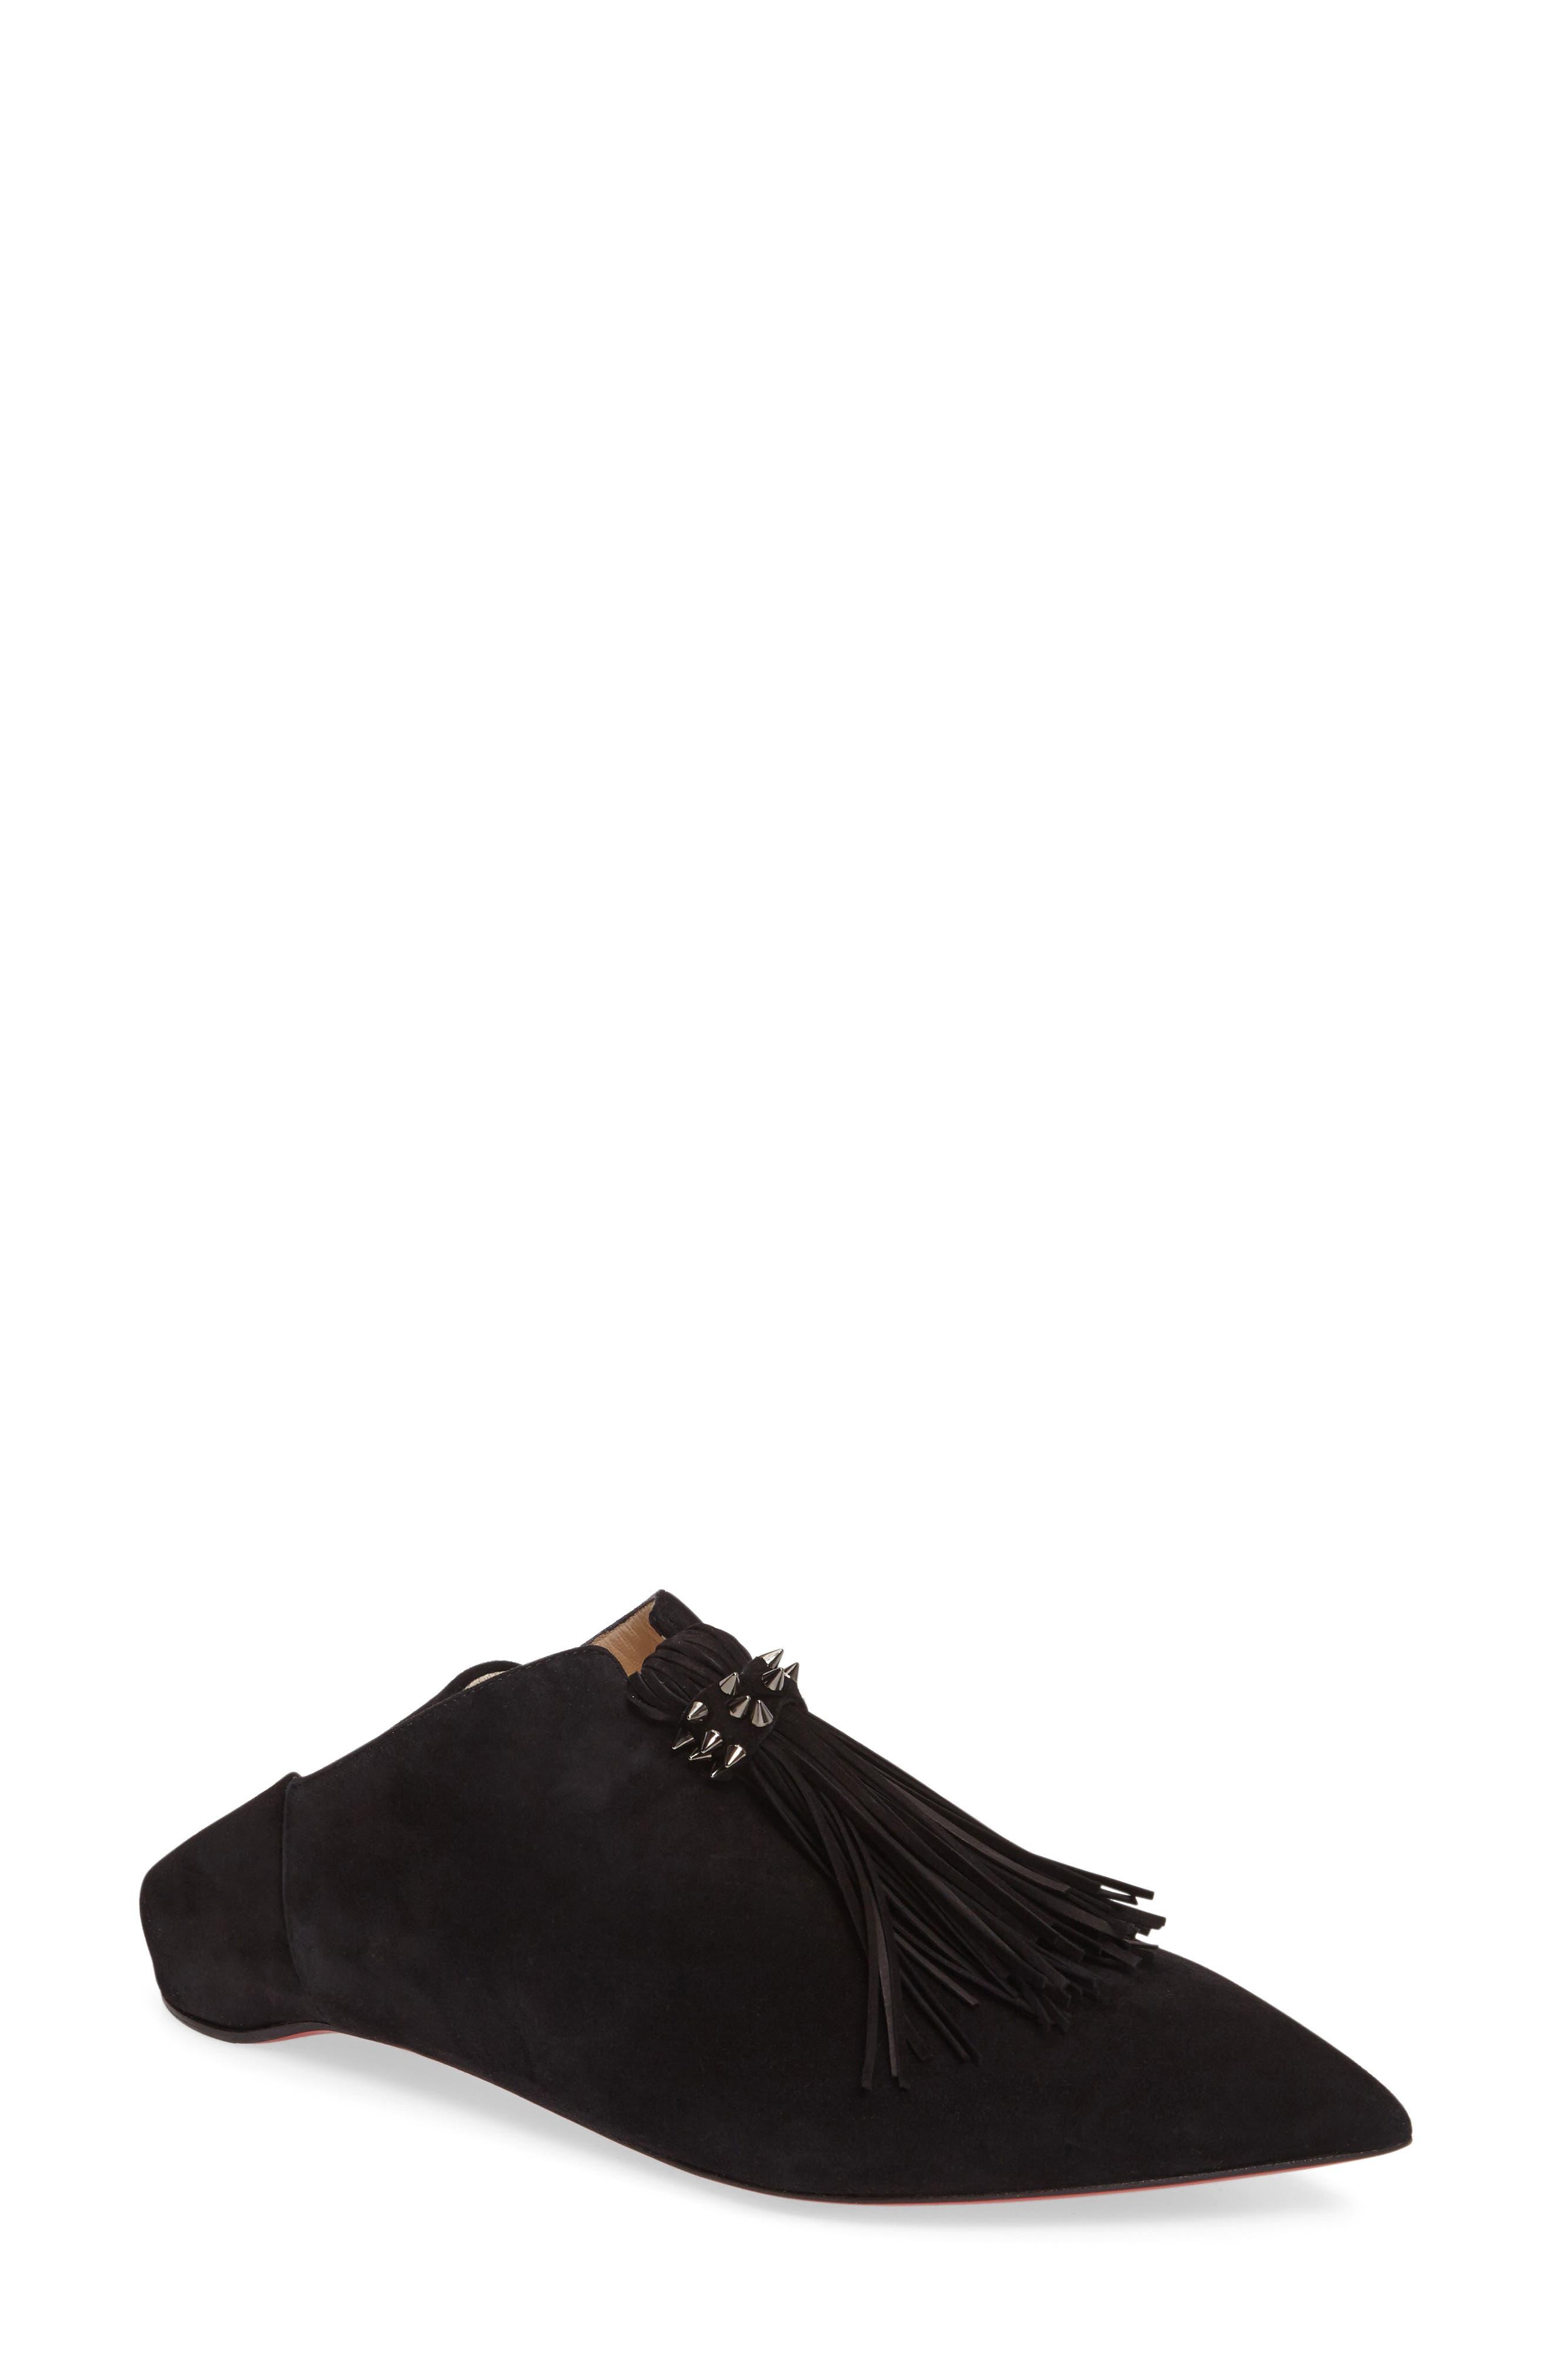 Medinana Convertible Loafer,                             Alternate thumbnail 9, color,                             001